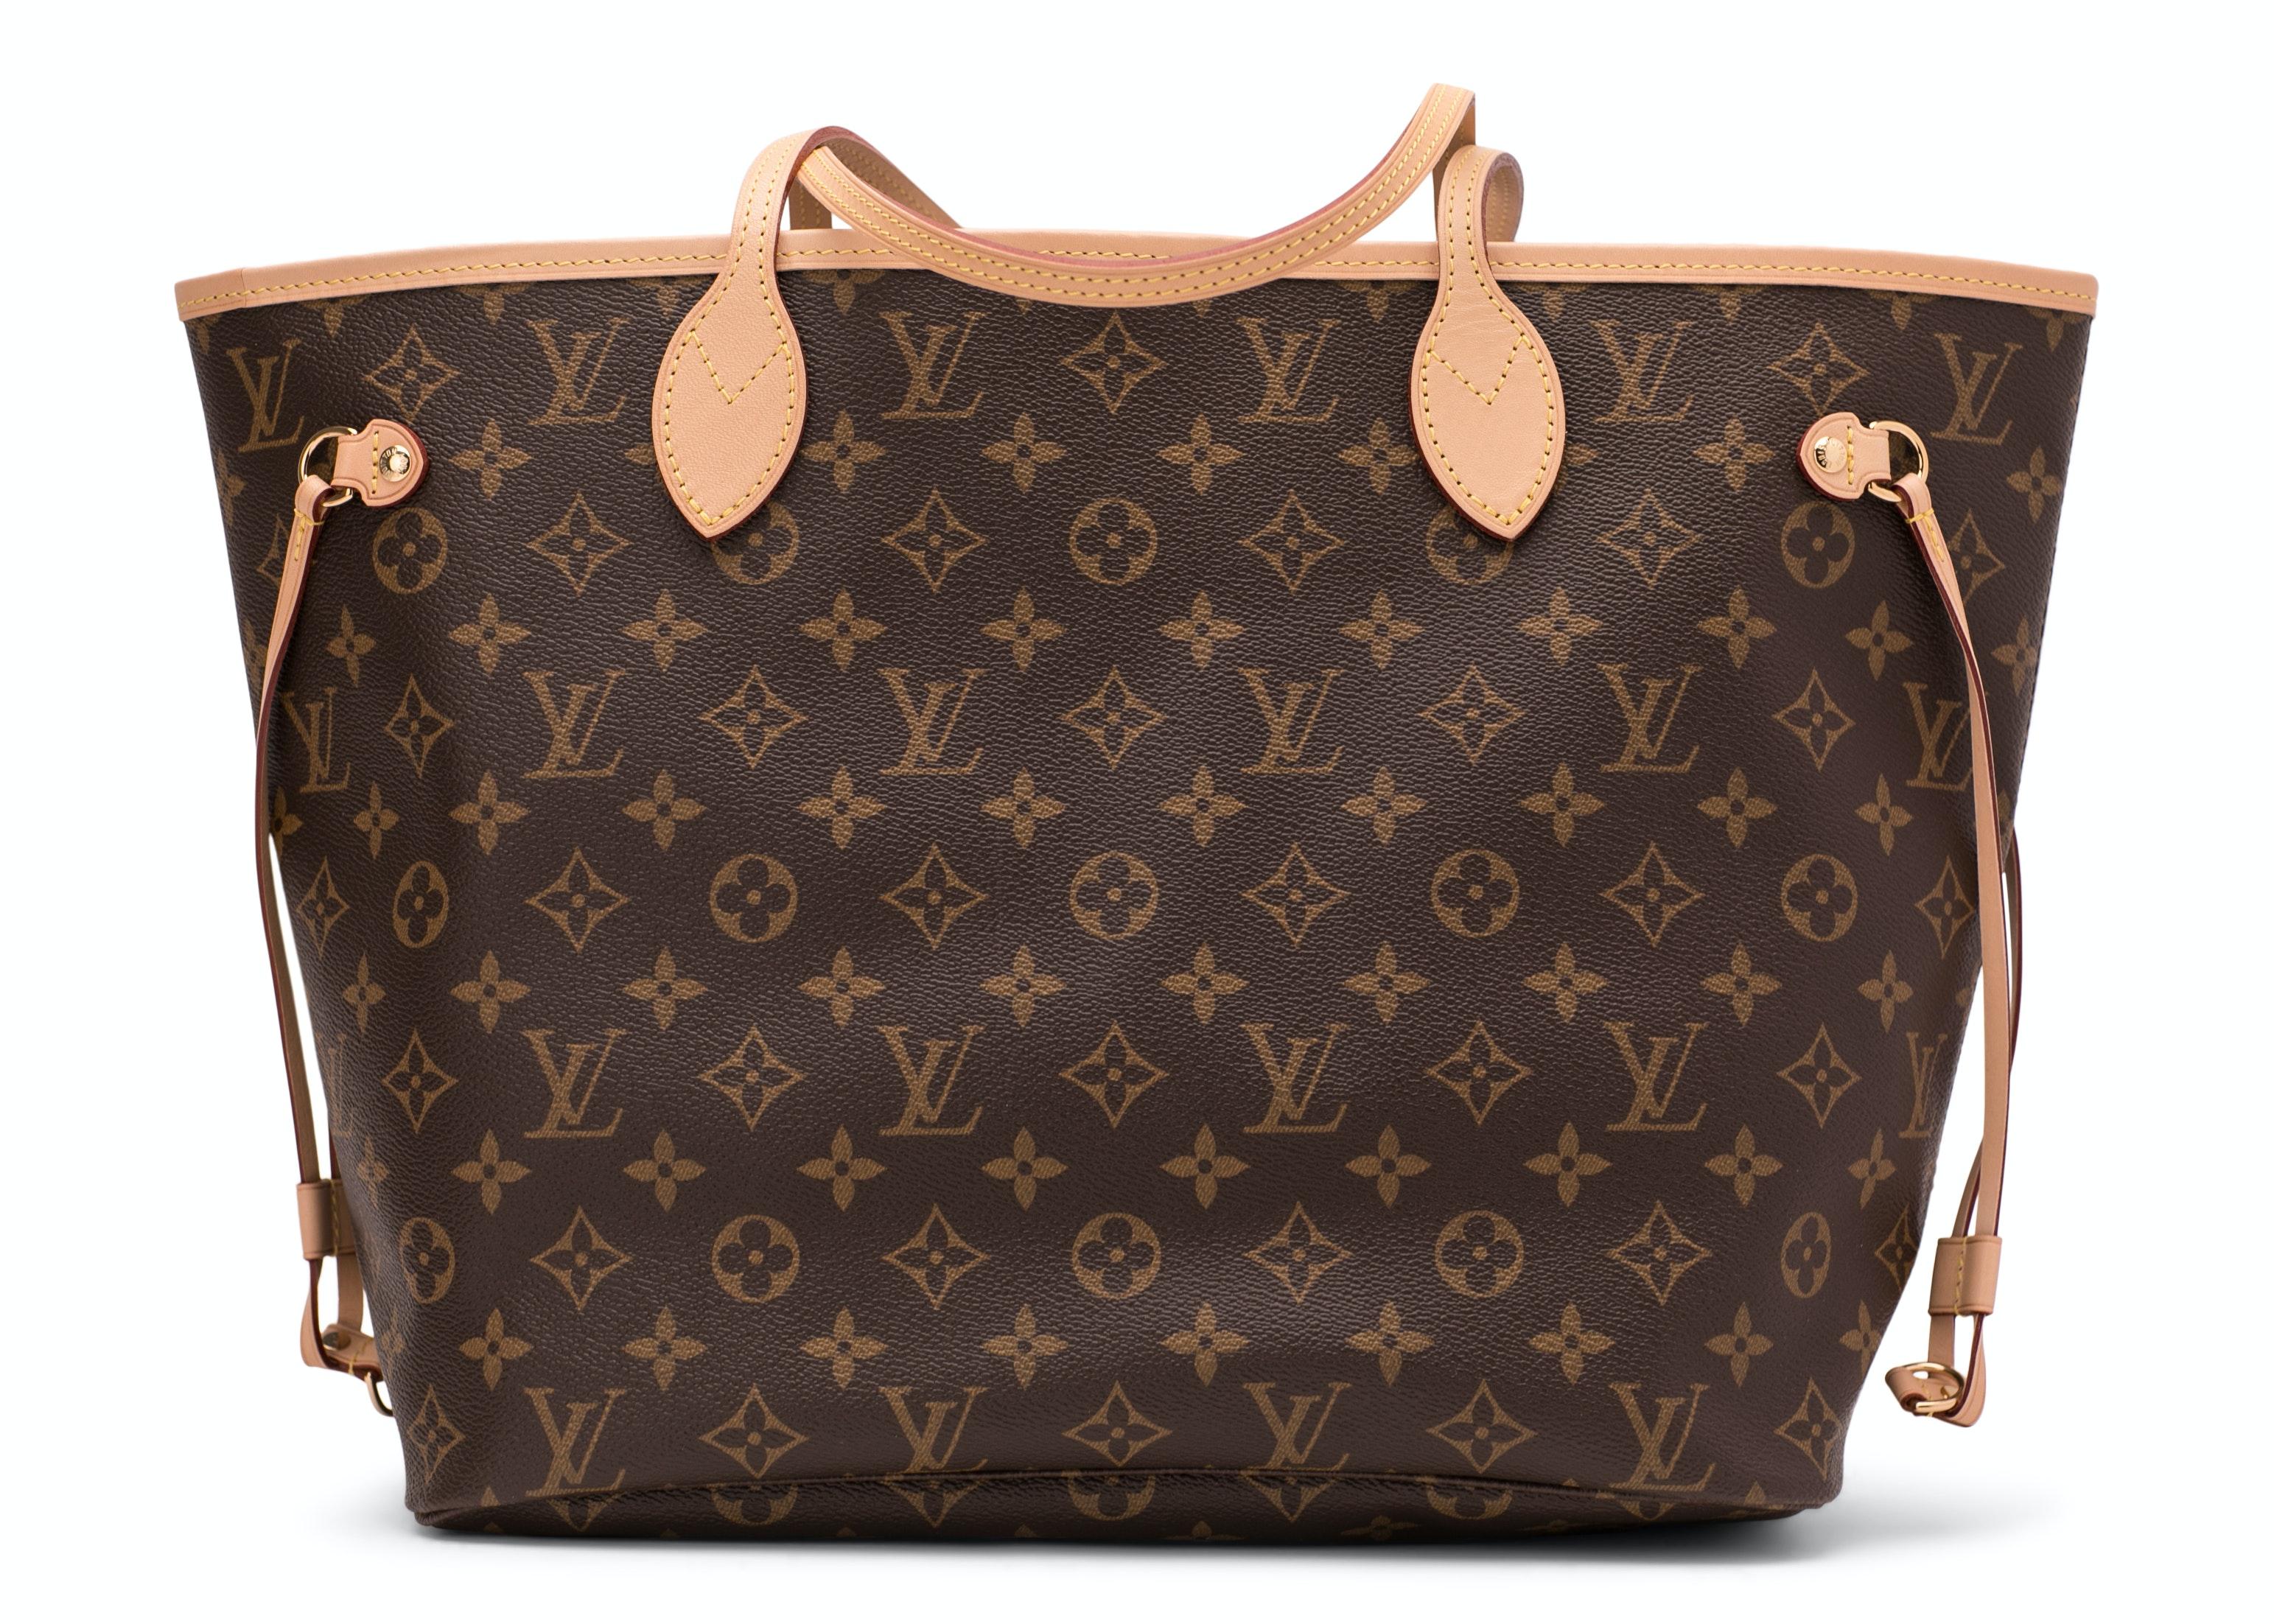 Louis Vuitton Neverfull Monogram MM Brown